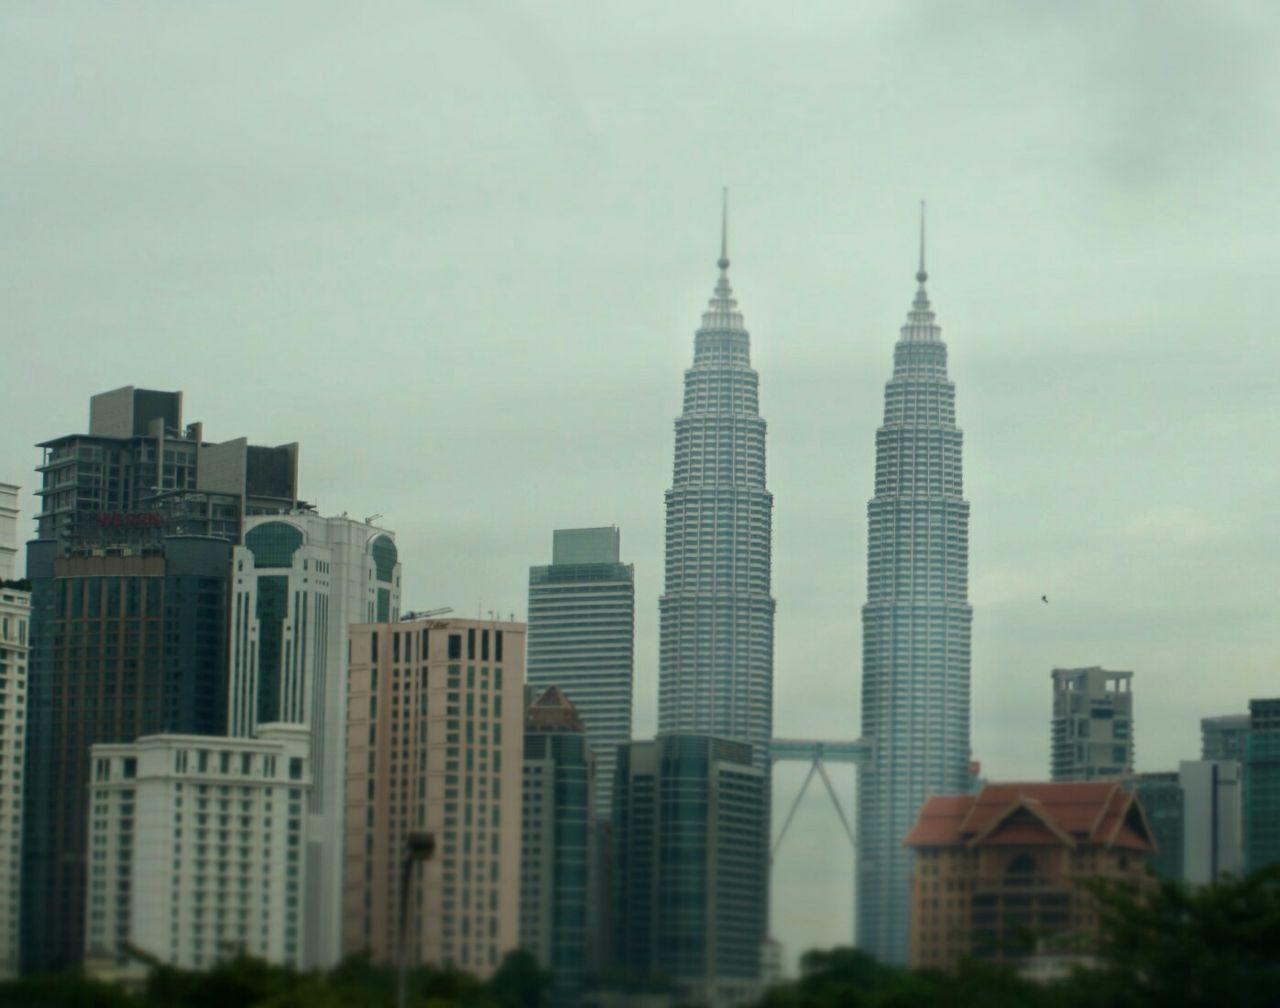 Precision Klcc Klcity Malaysia Cityscapes